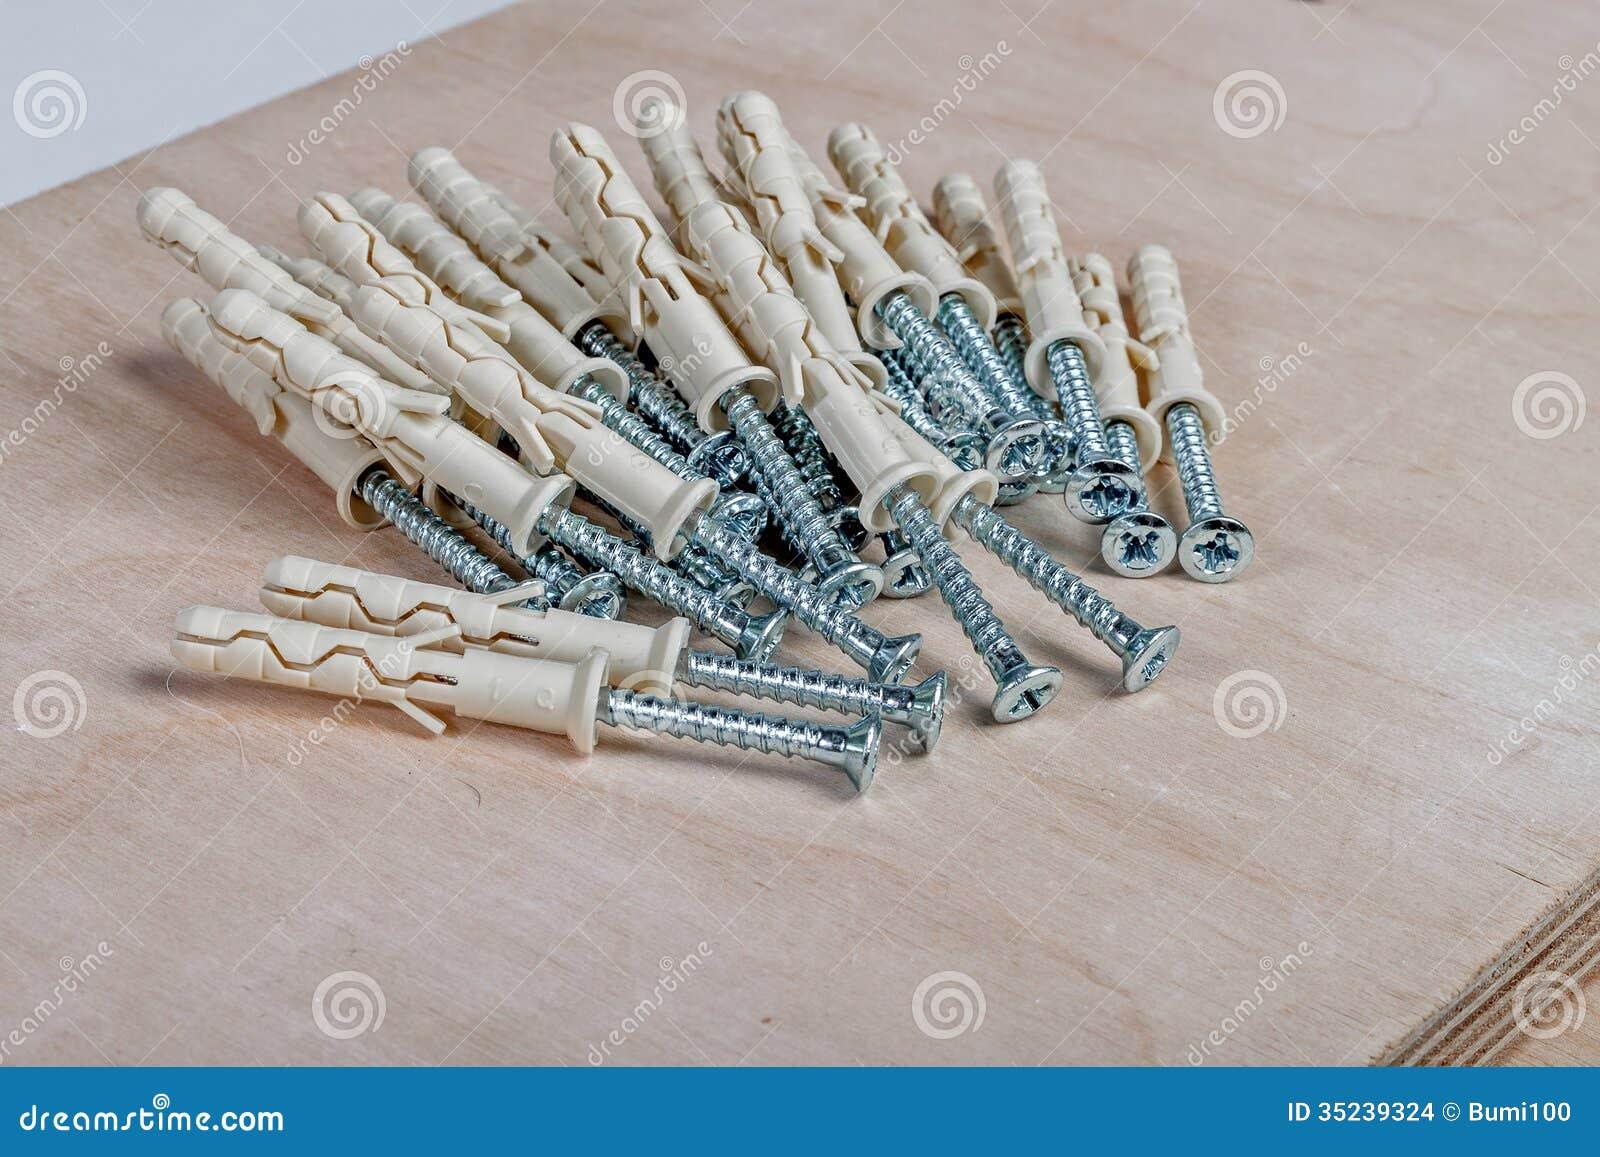 plywood screws